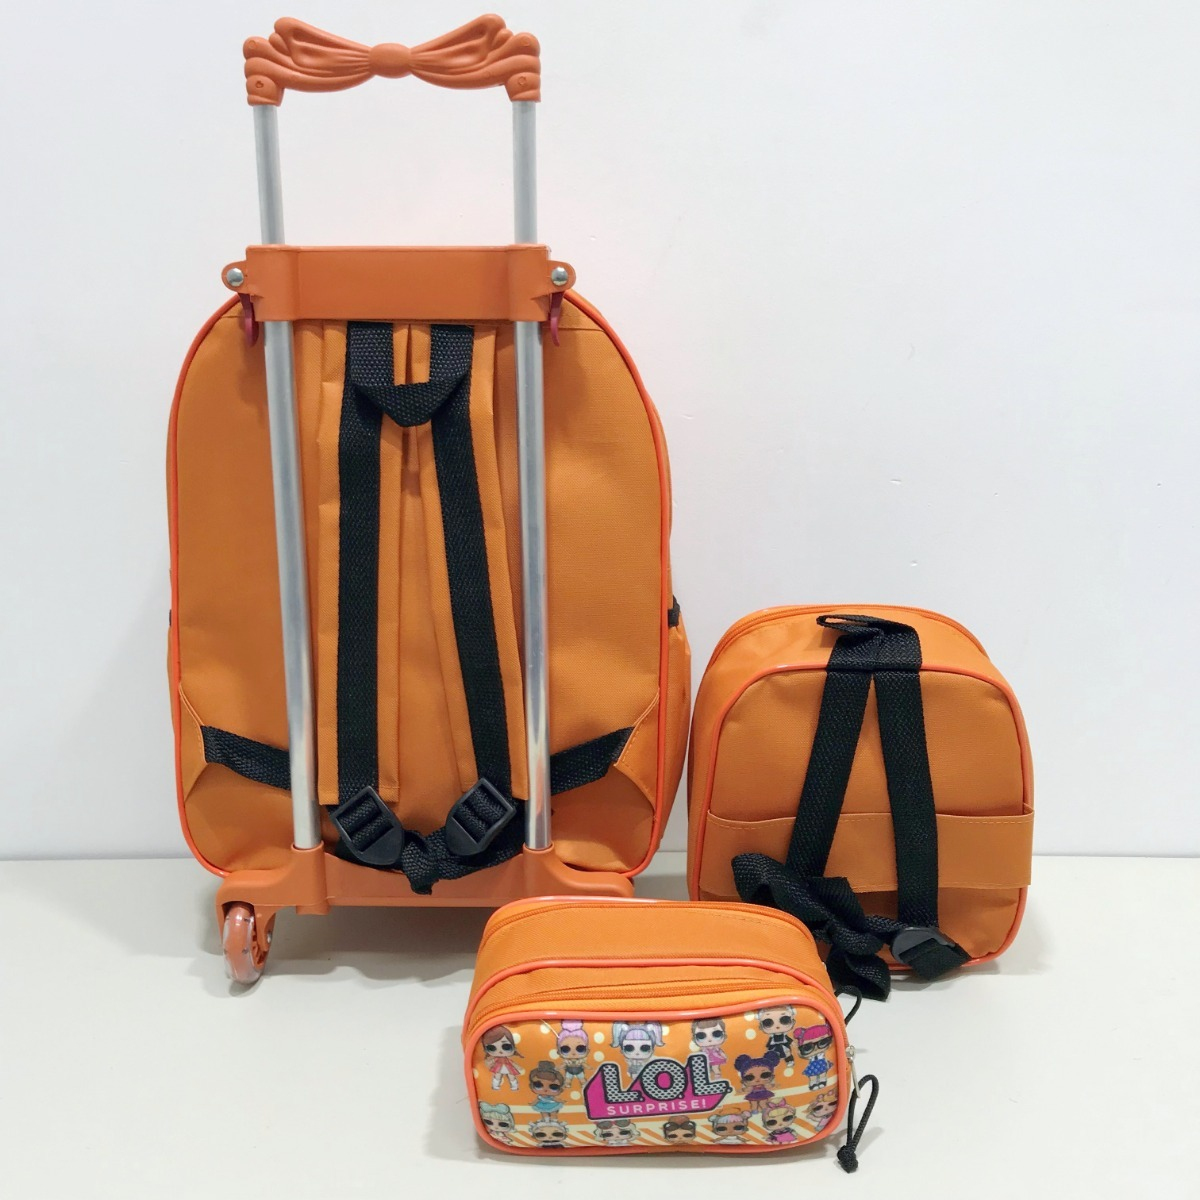 bde9ec9aa3 mochila rodinha infantil lol surprise modelo 2019 laranja. Carregando zoom.